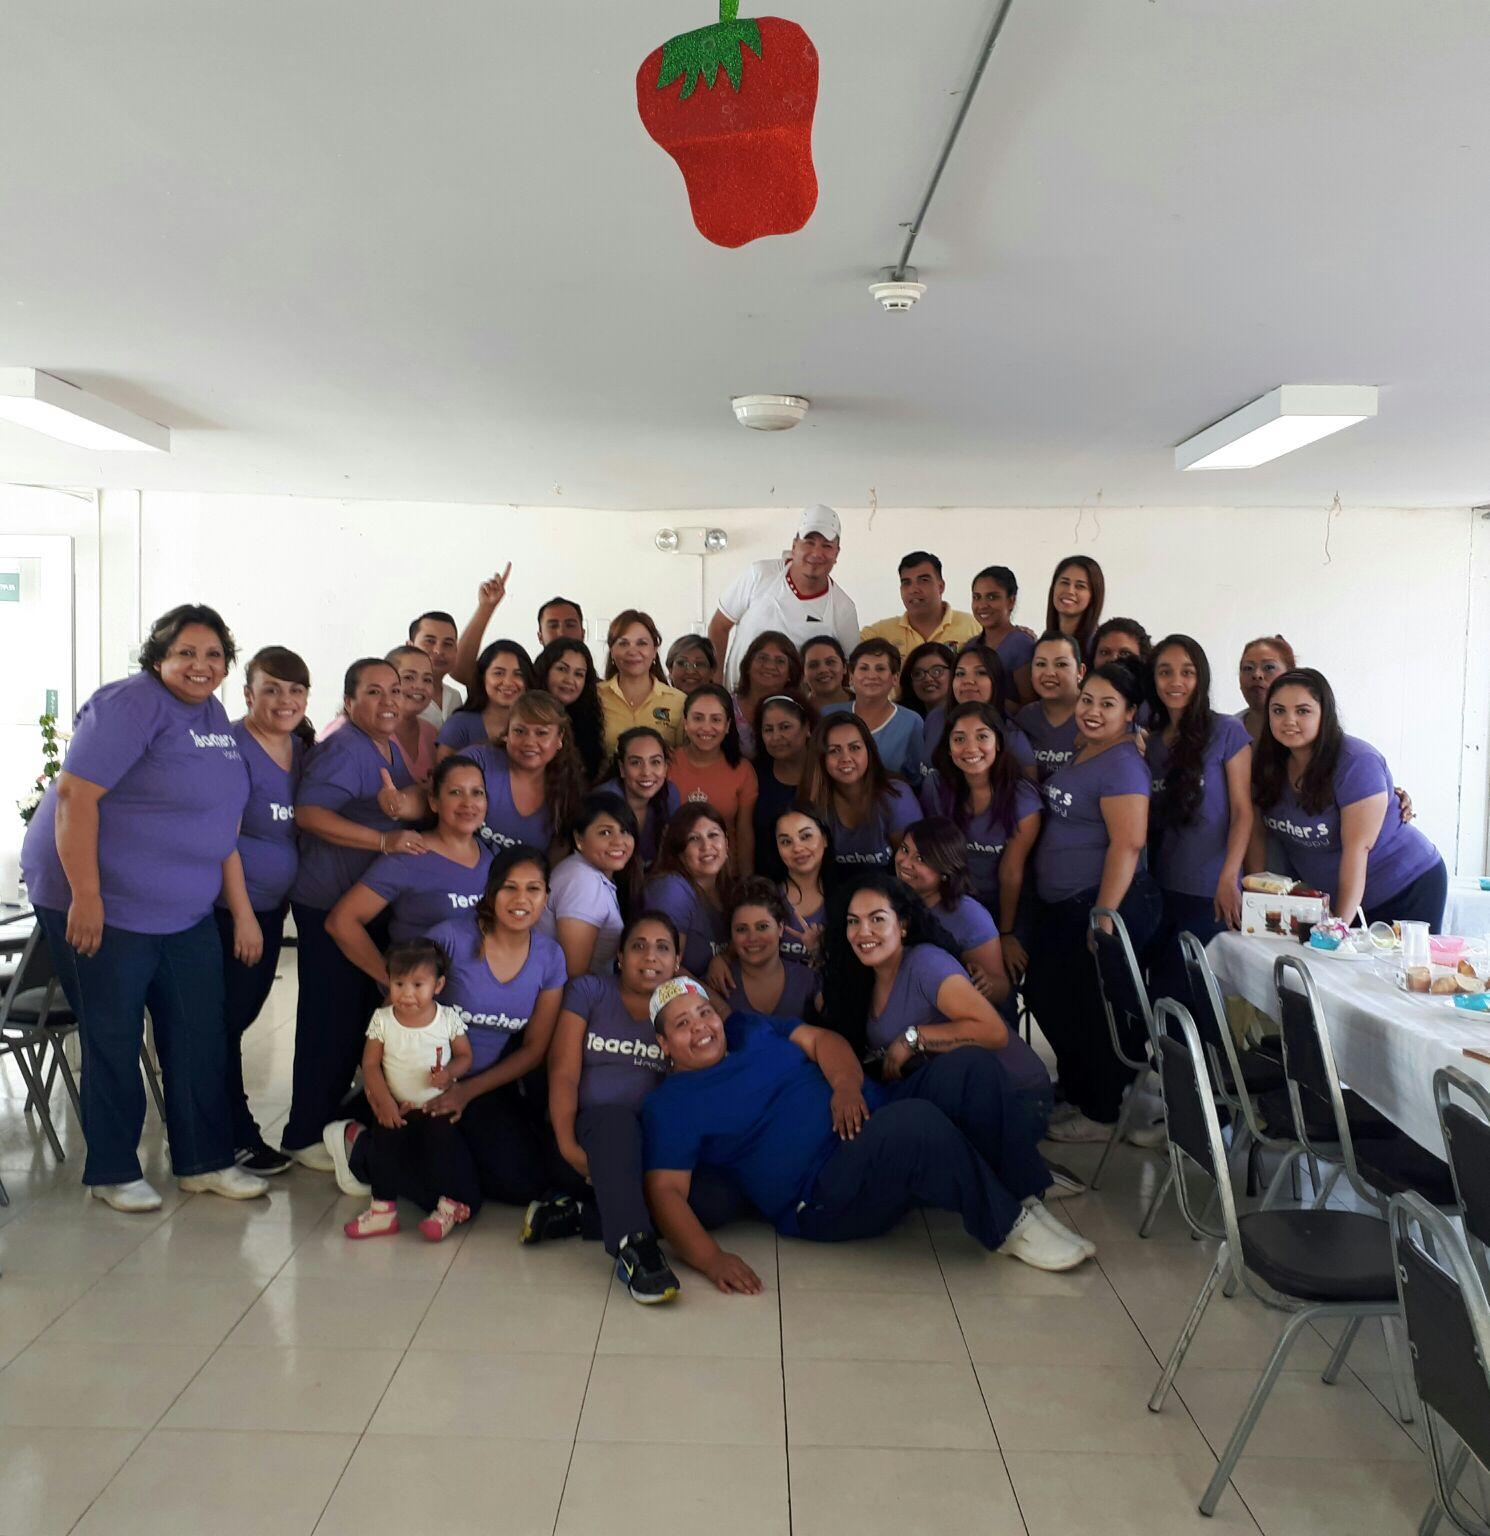 Imparten curso para Coordinadoras de Asistentes Médicas